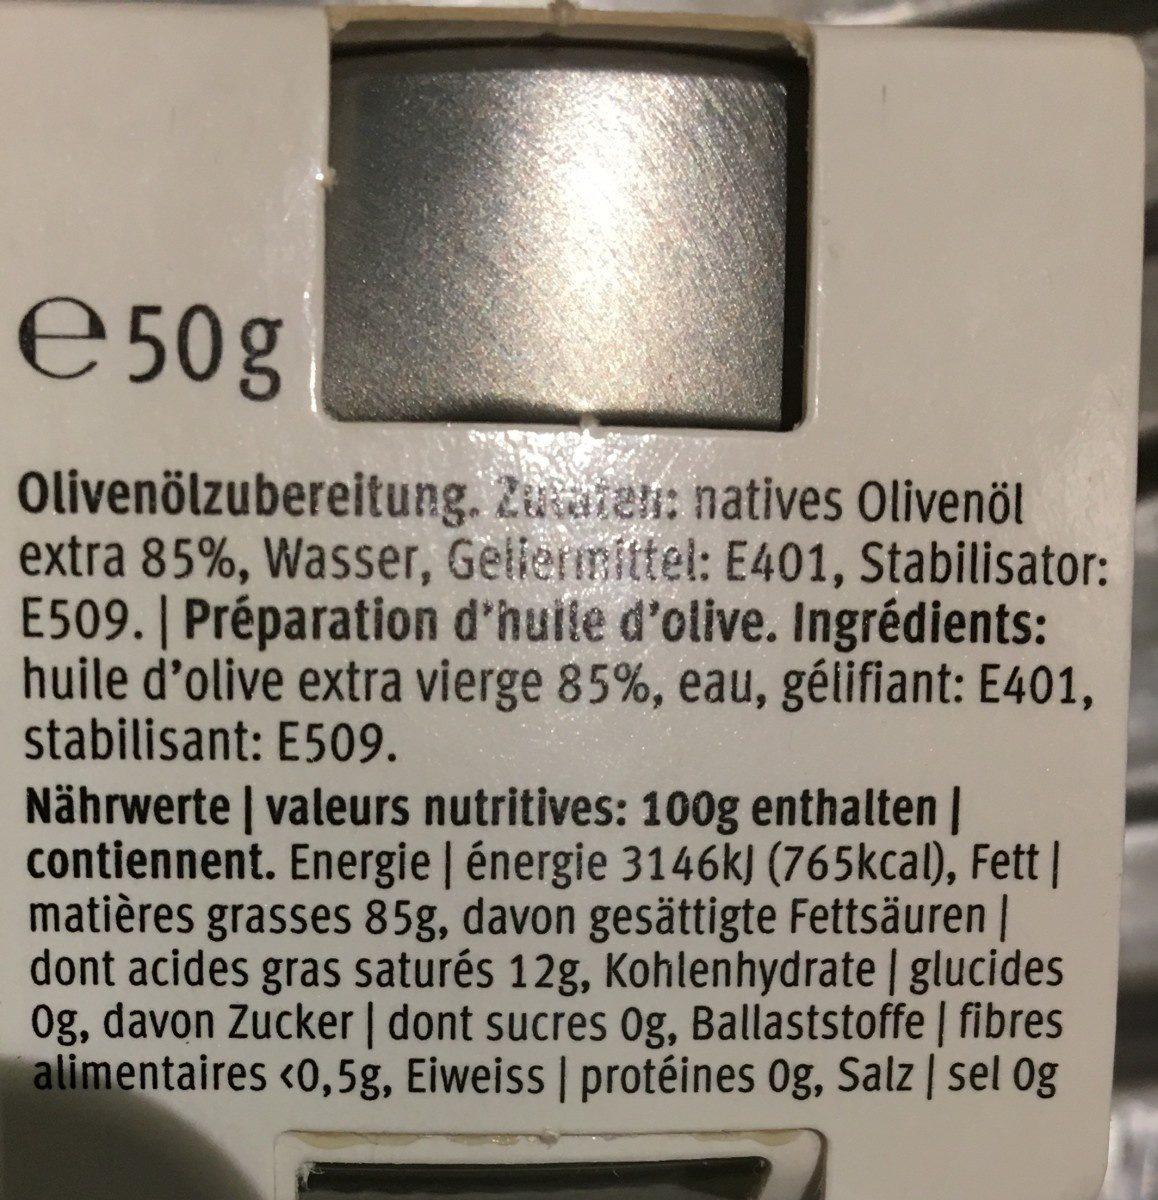 Perles d'huile d'olive extra vierge - Ingrédients